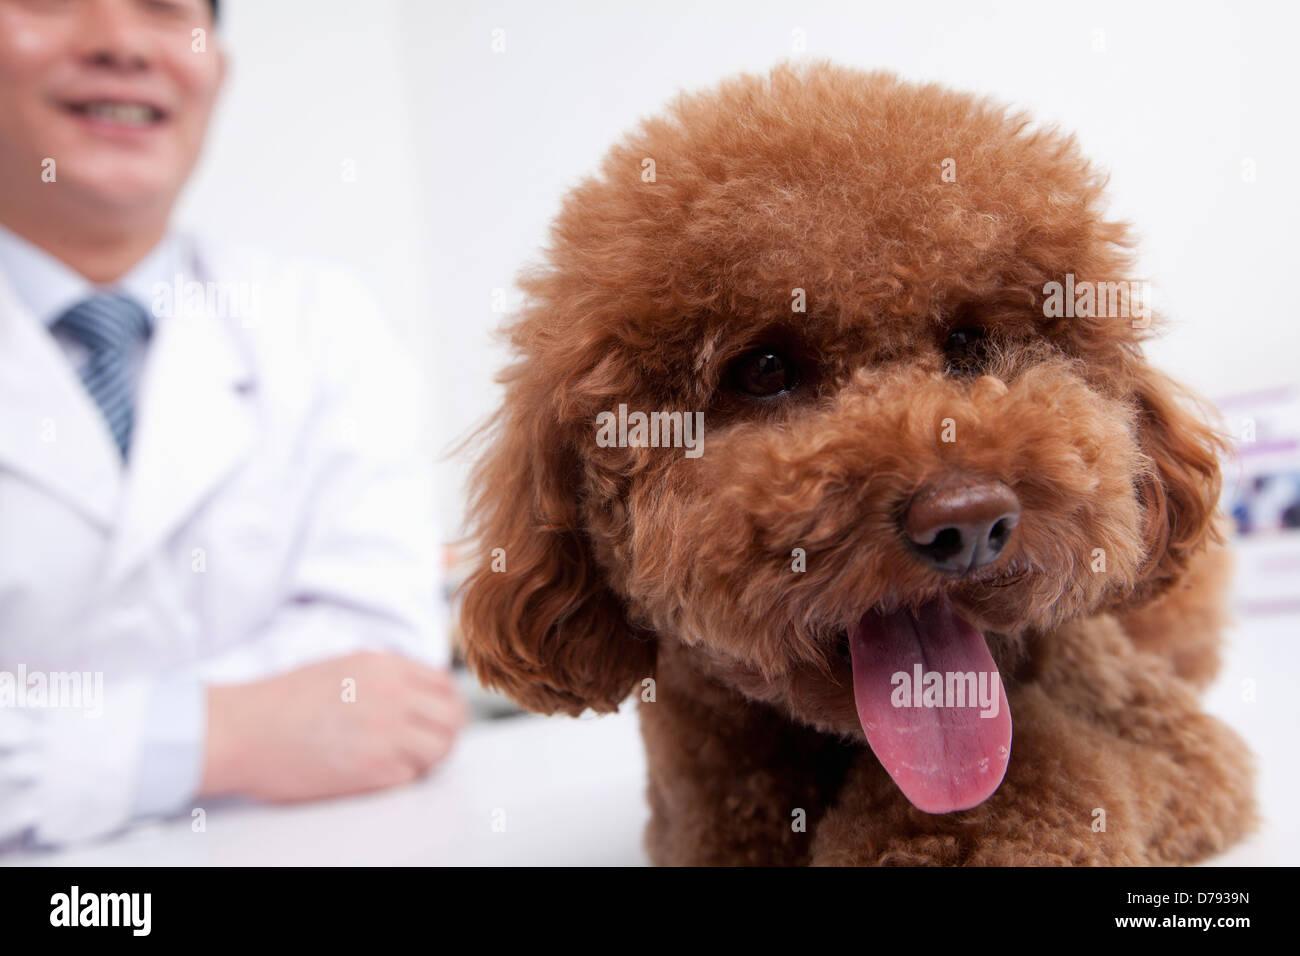 Dog in veterinarian's office - Stock Image